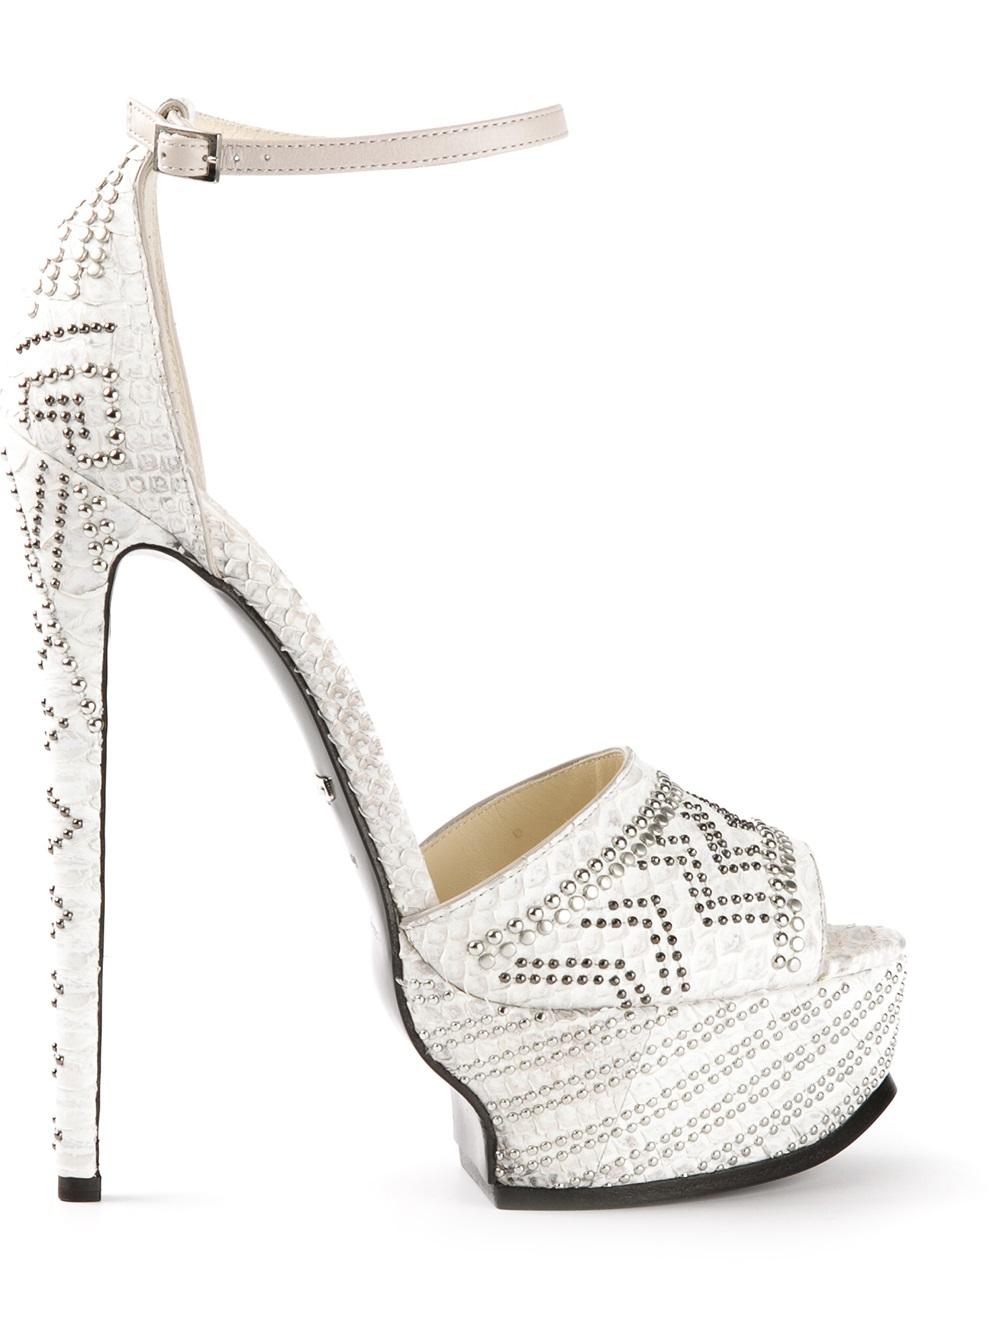 76a15c3706744 Roberto Cavalli Embellished Platform Sandals in White - Lyst